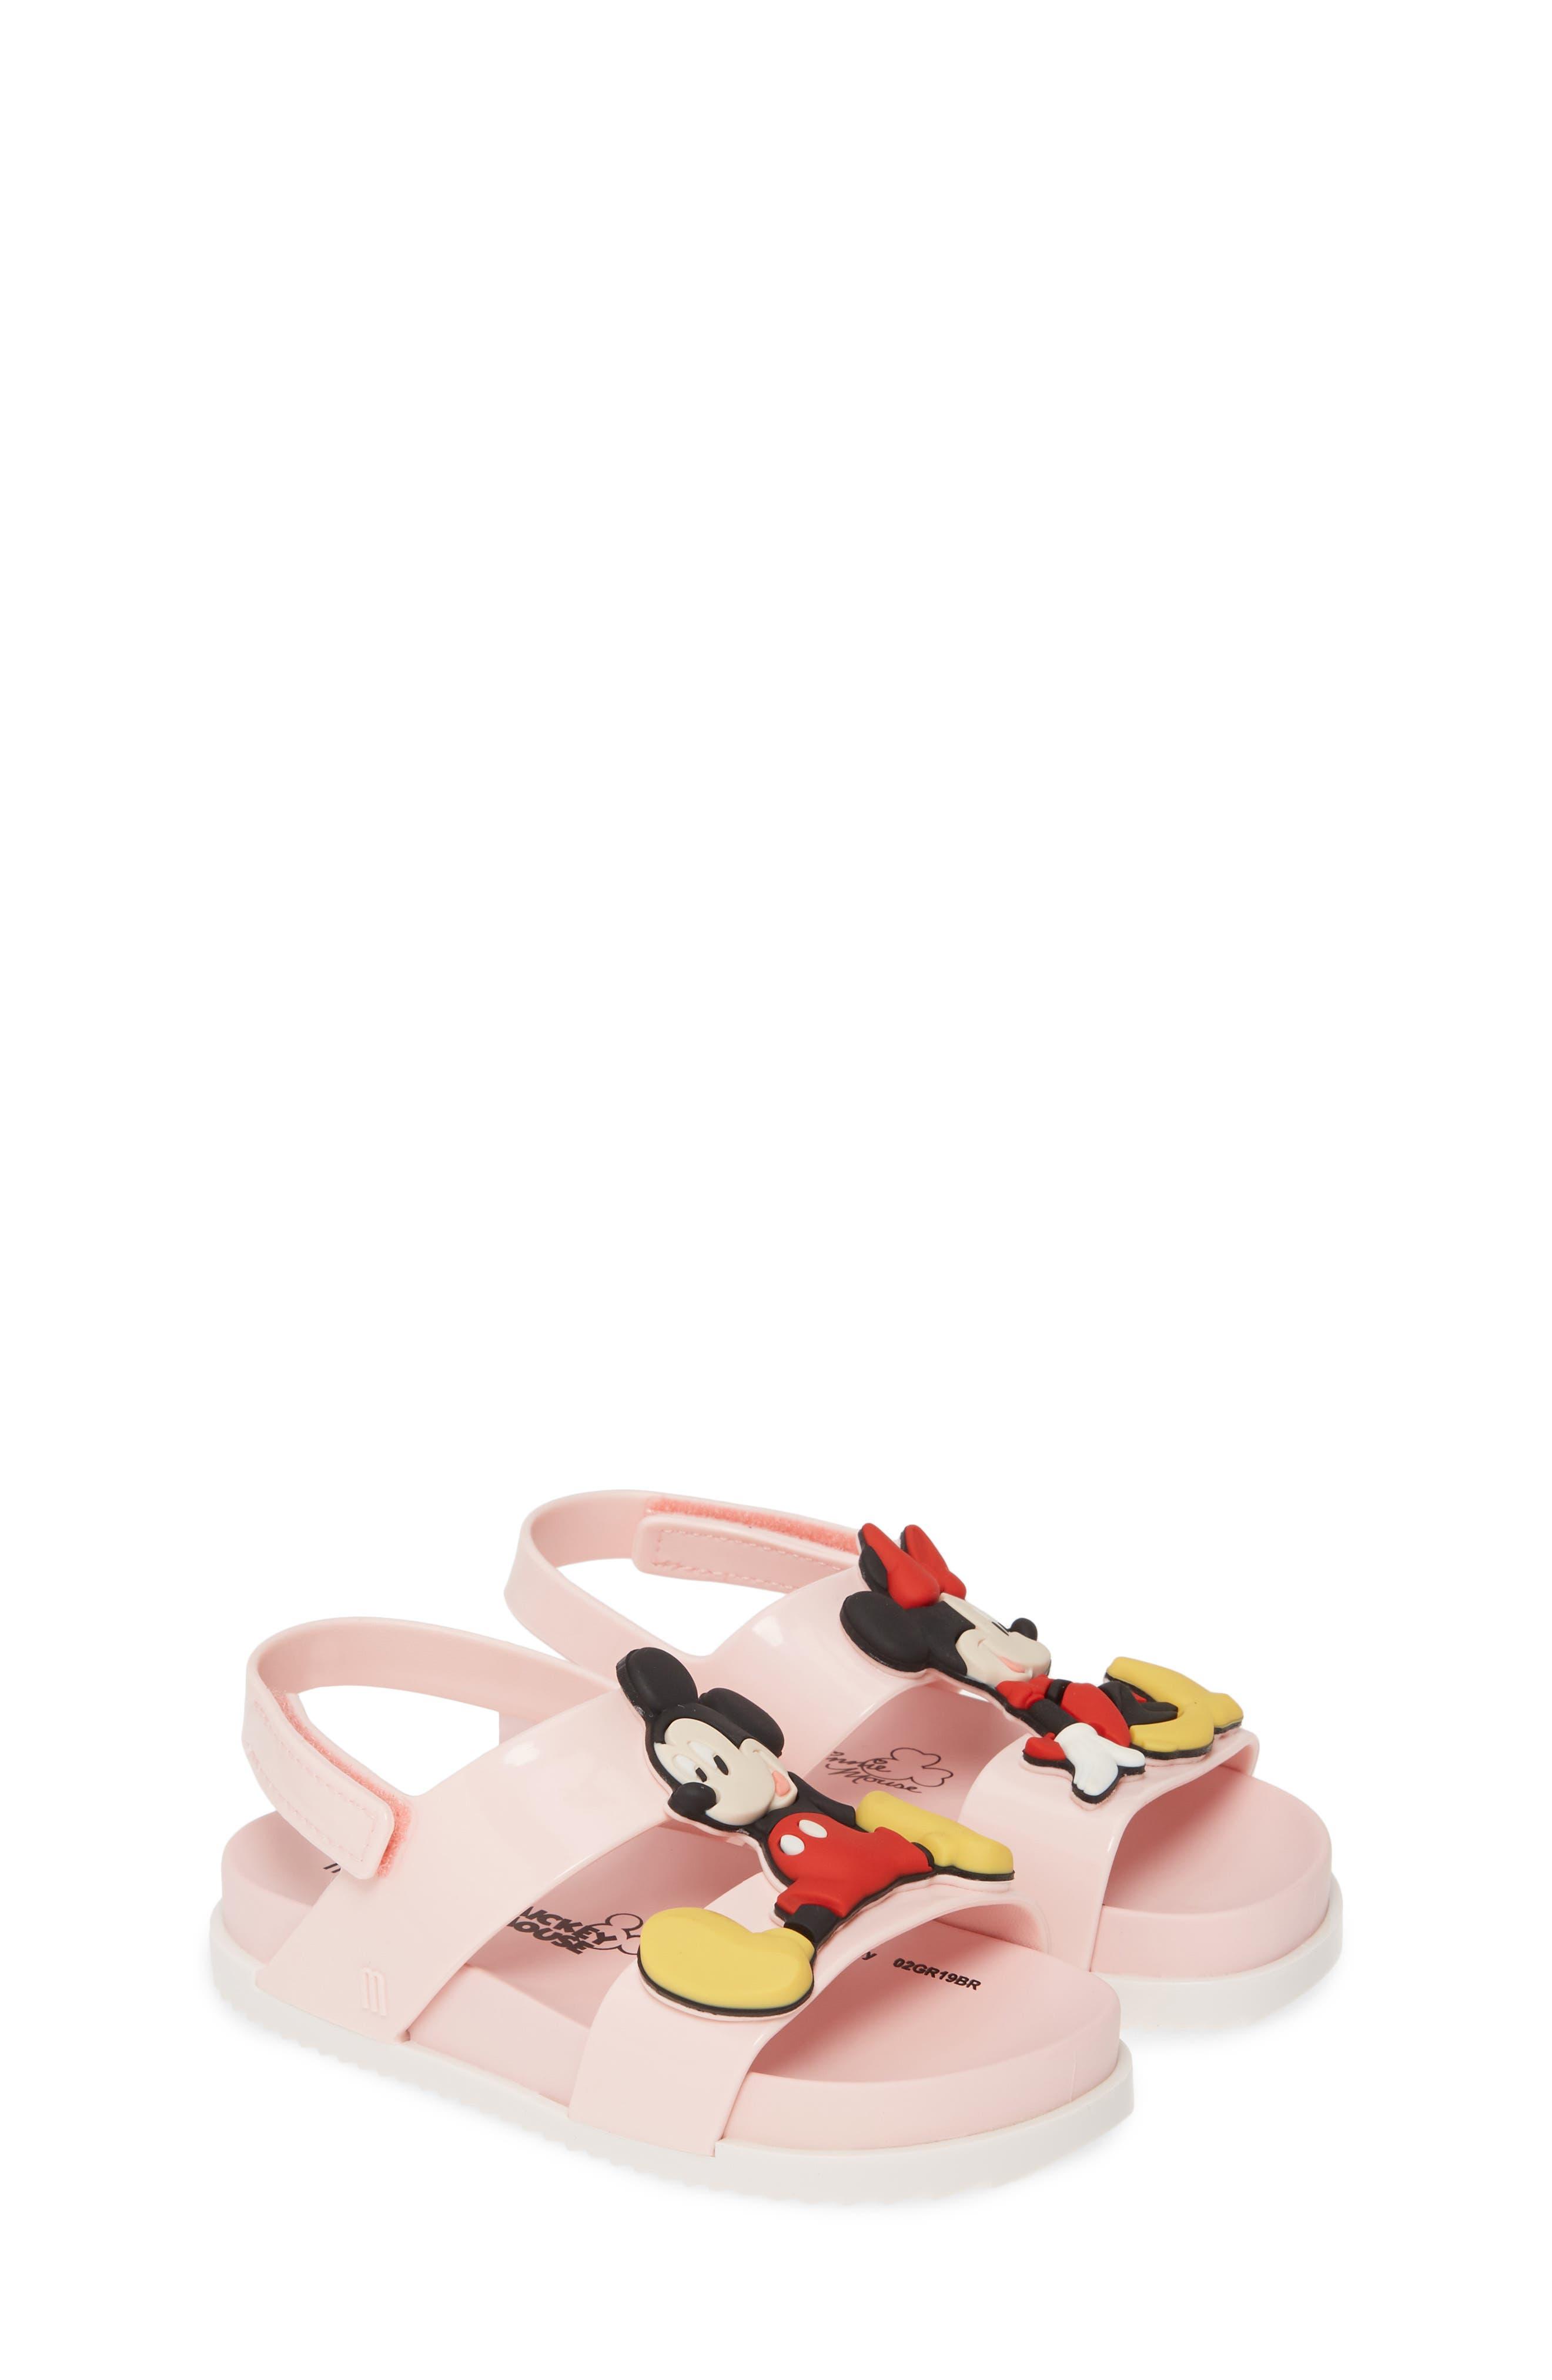 Toddler Girls Mini Melissa X Disney Cosmic Sandal Size 11 M  Pink